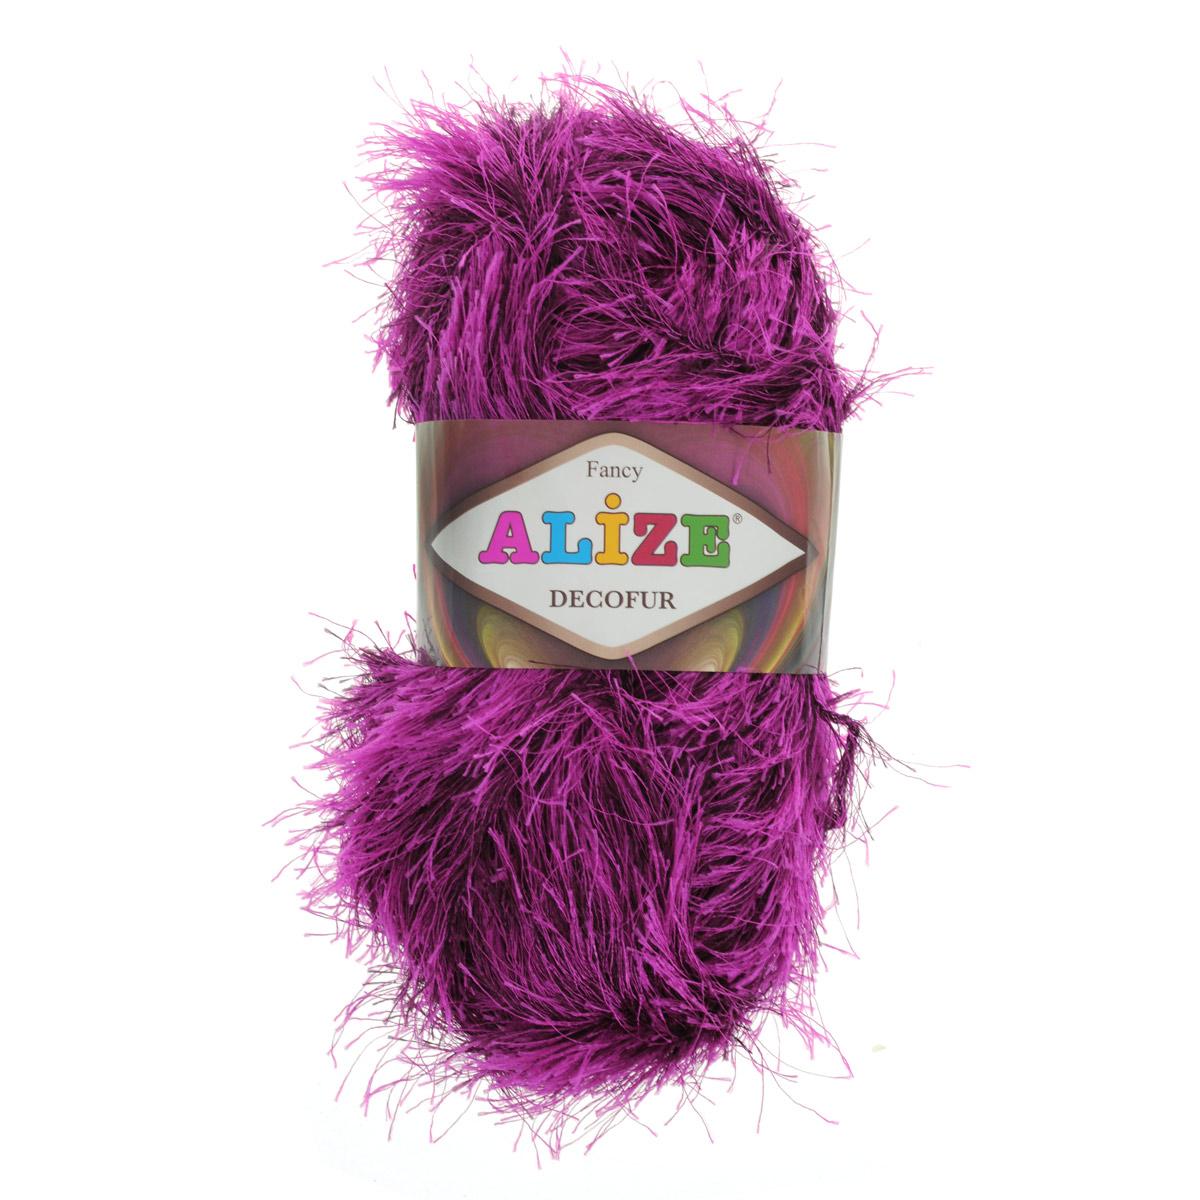 Пряжа для вязания Alize Decofur, цвет: фуксия, бордовый (1363), 110 м, 100 г, 5 шт цена